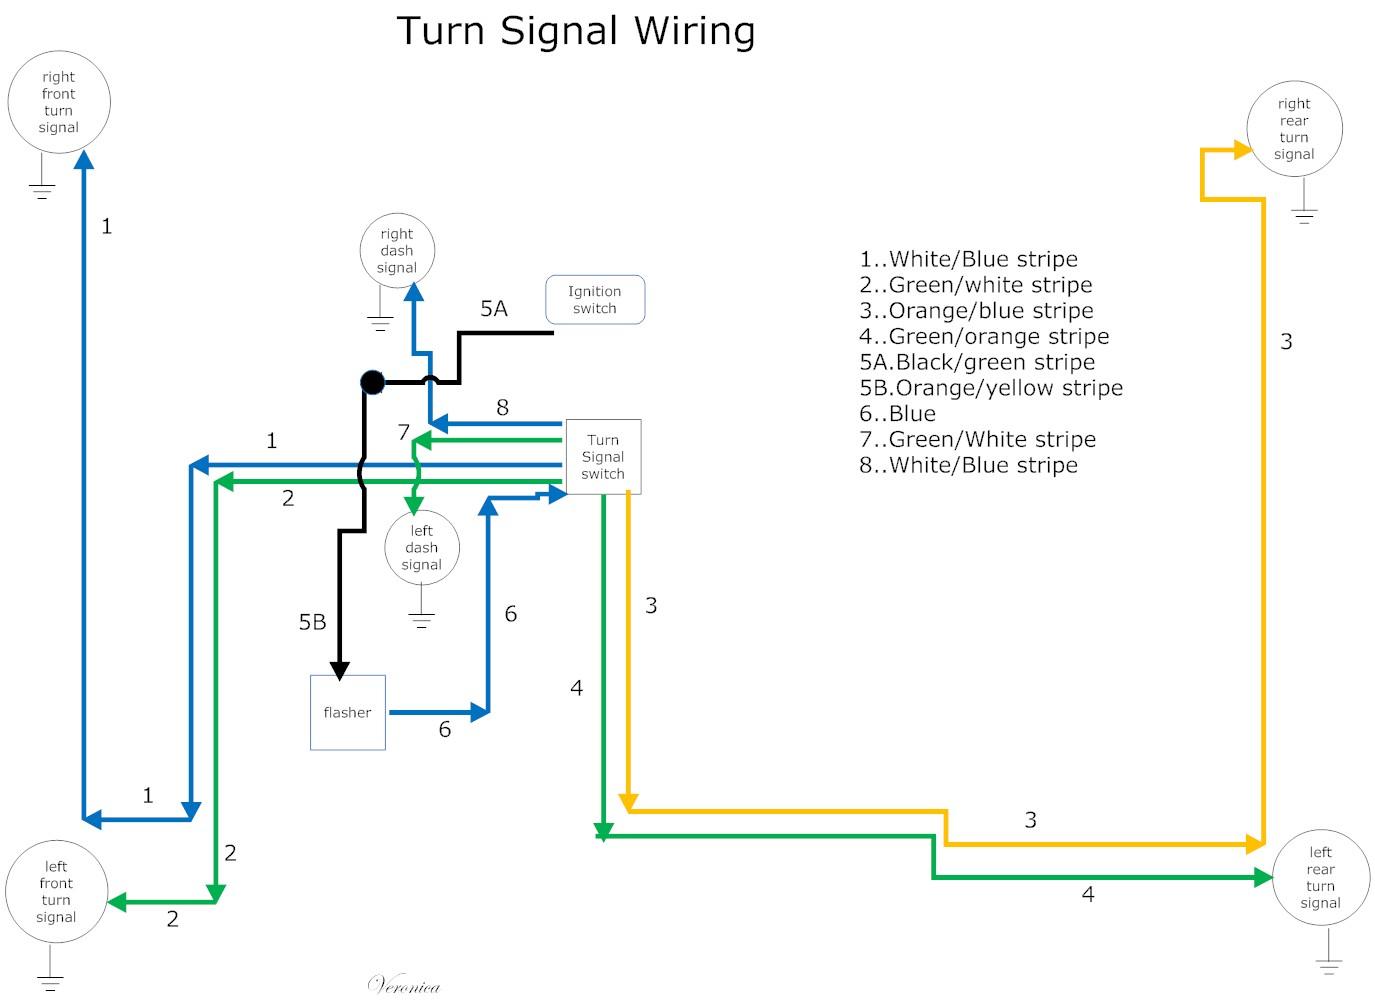 medium resolution of 1973 mustang tail light wiring diagram 1968 mustang ke light wiring diagram 1968 ford thunderbird tail